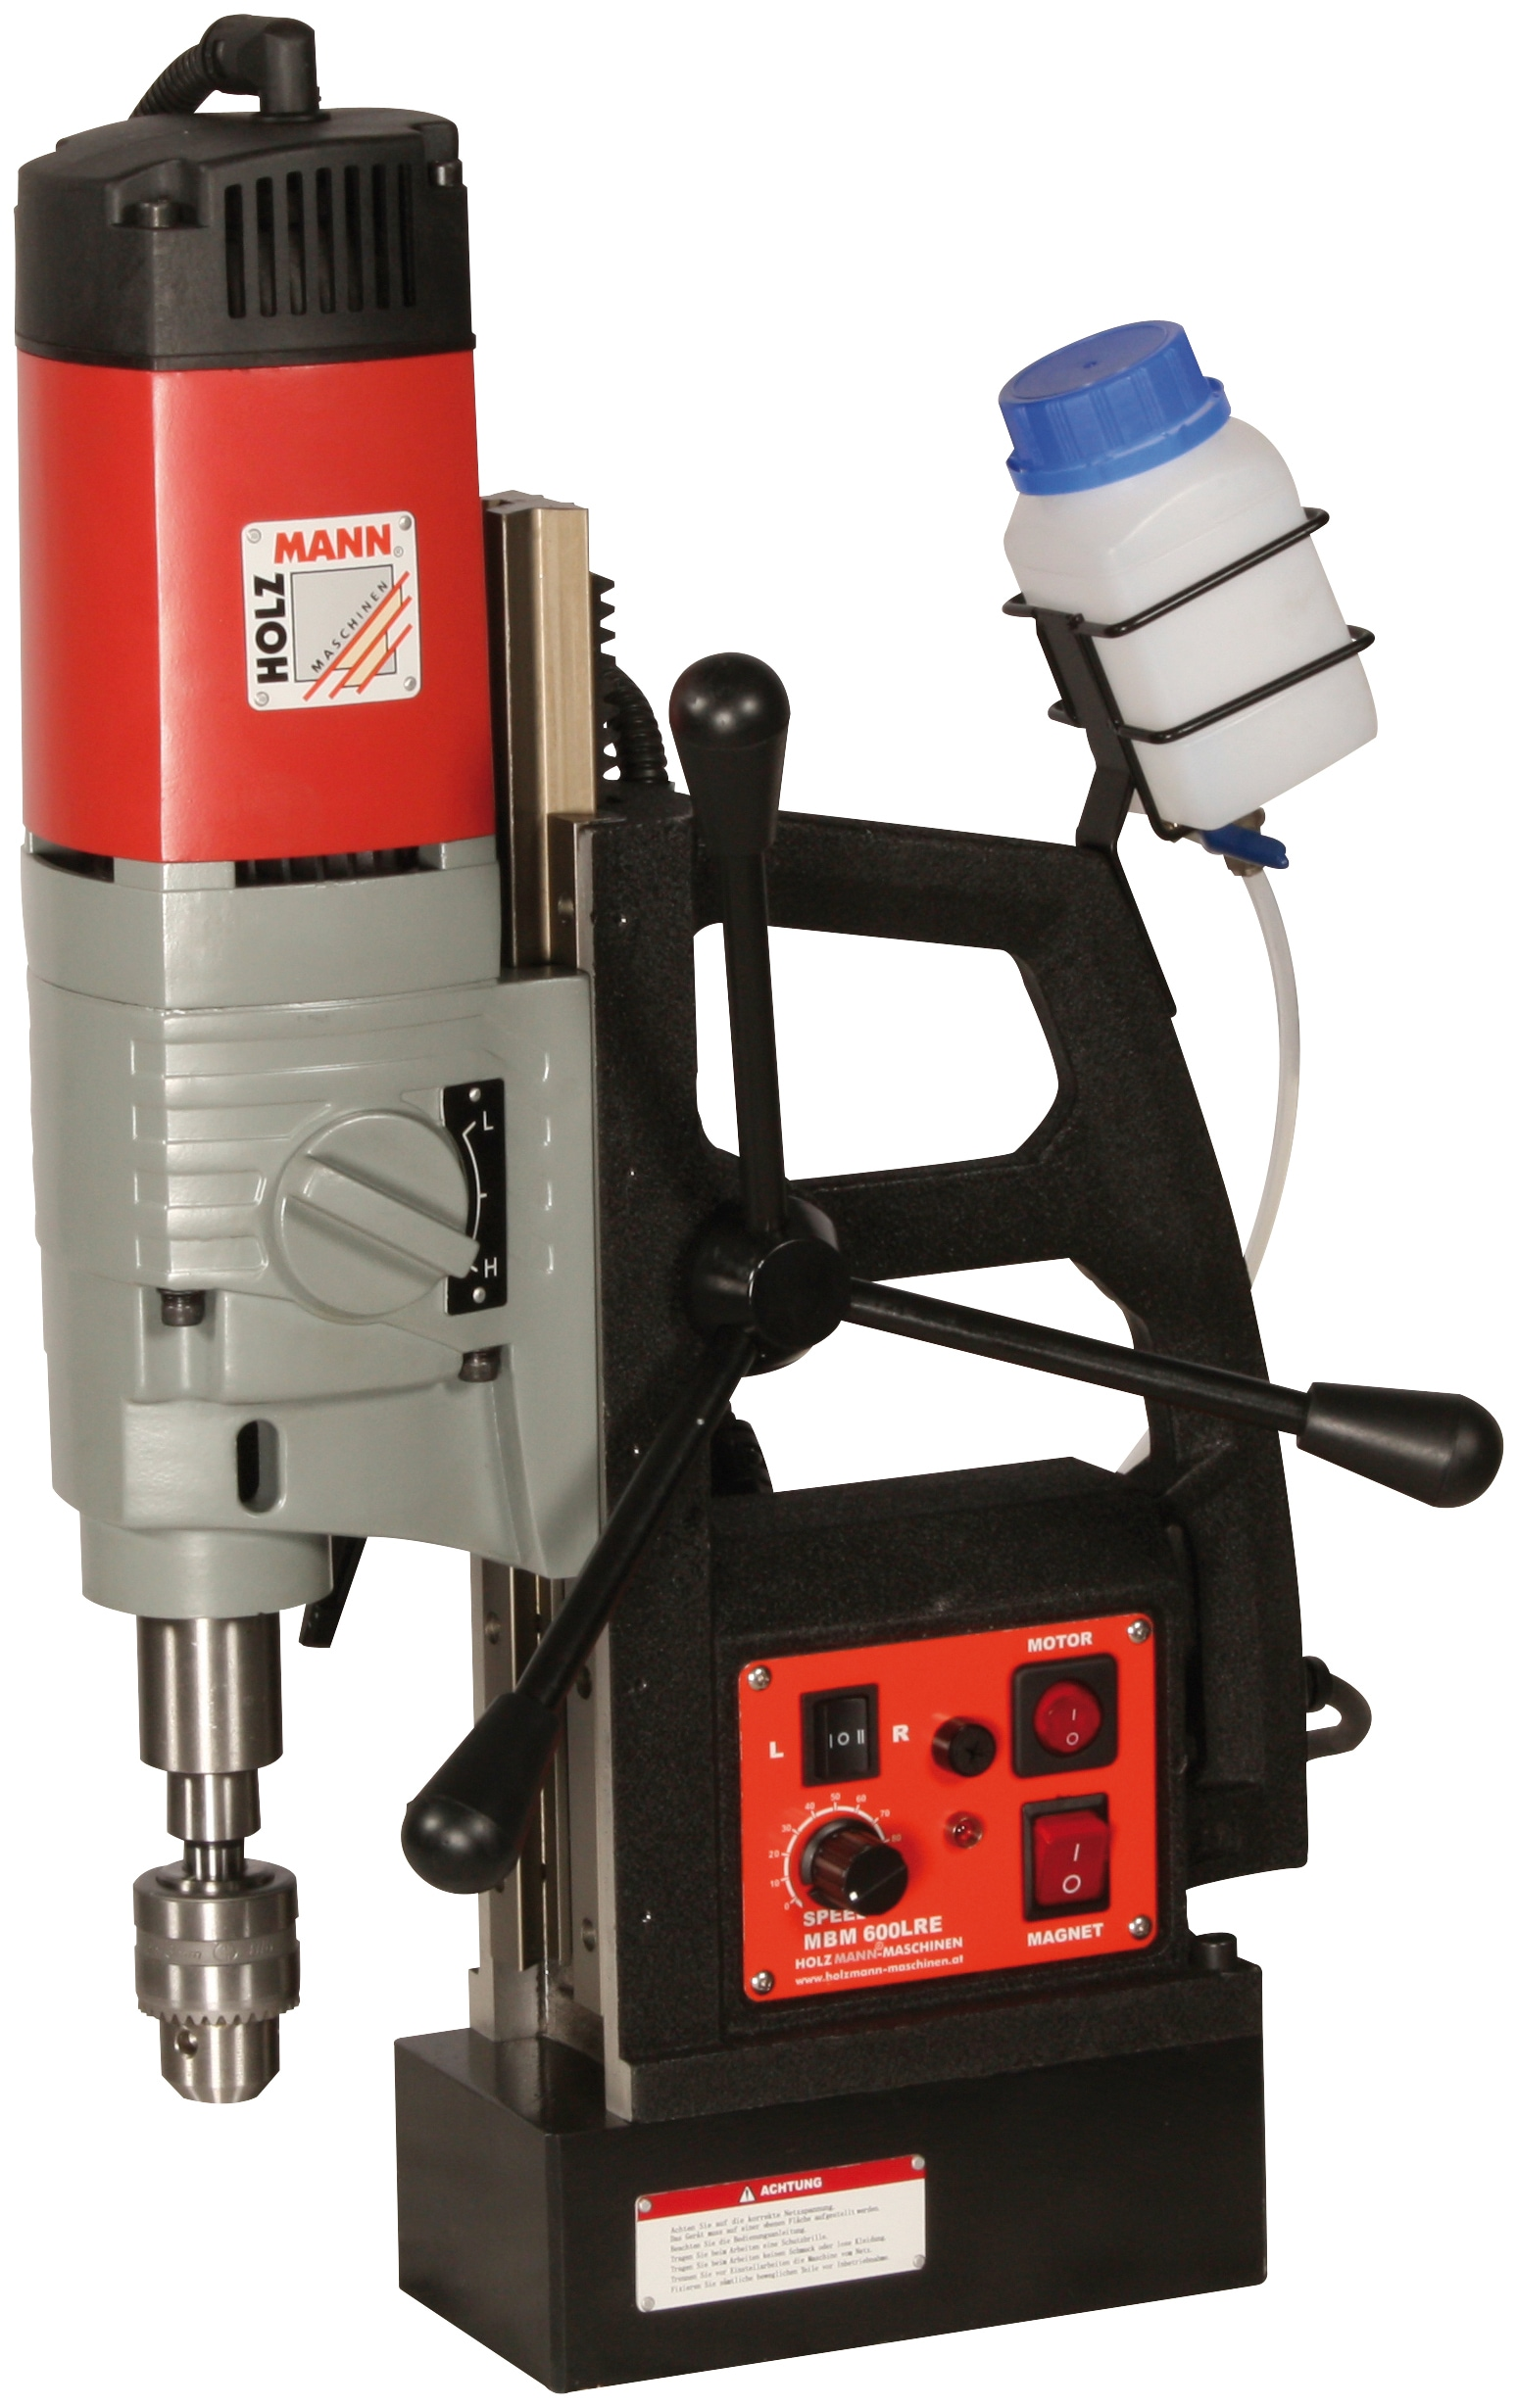 Holzmann Bohrmaschine »MBM600LRE_230V«